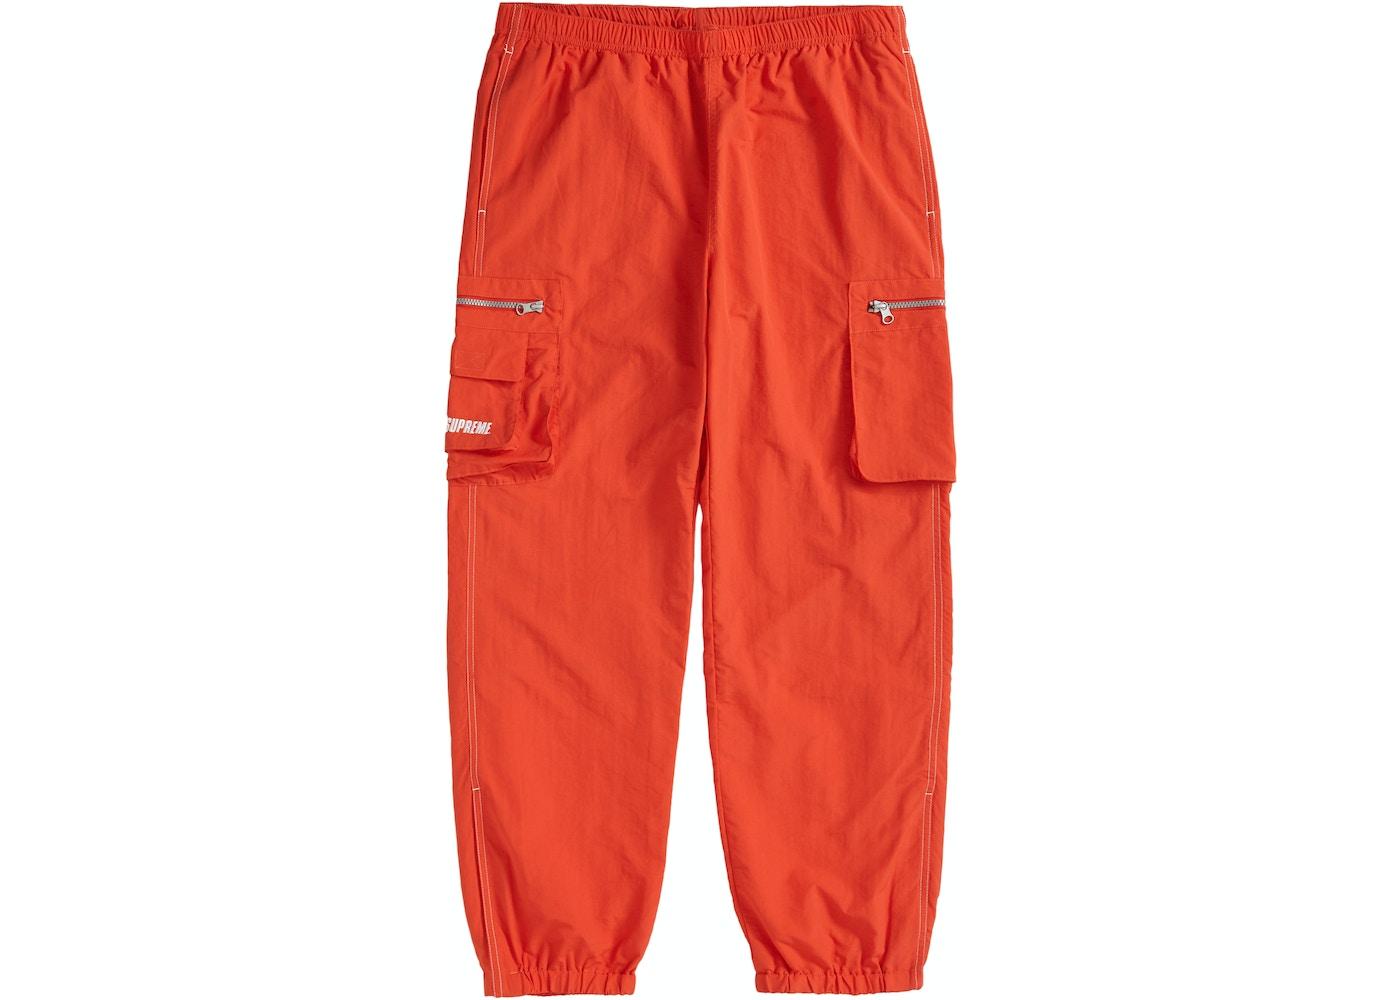 discount shop search for official catch Supreme Nylon Cargo Pant Dark Orange